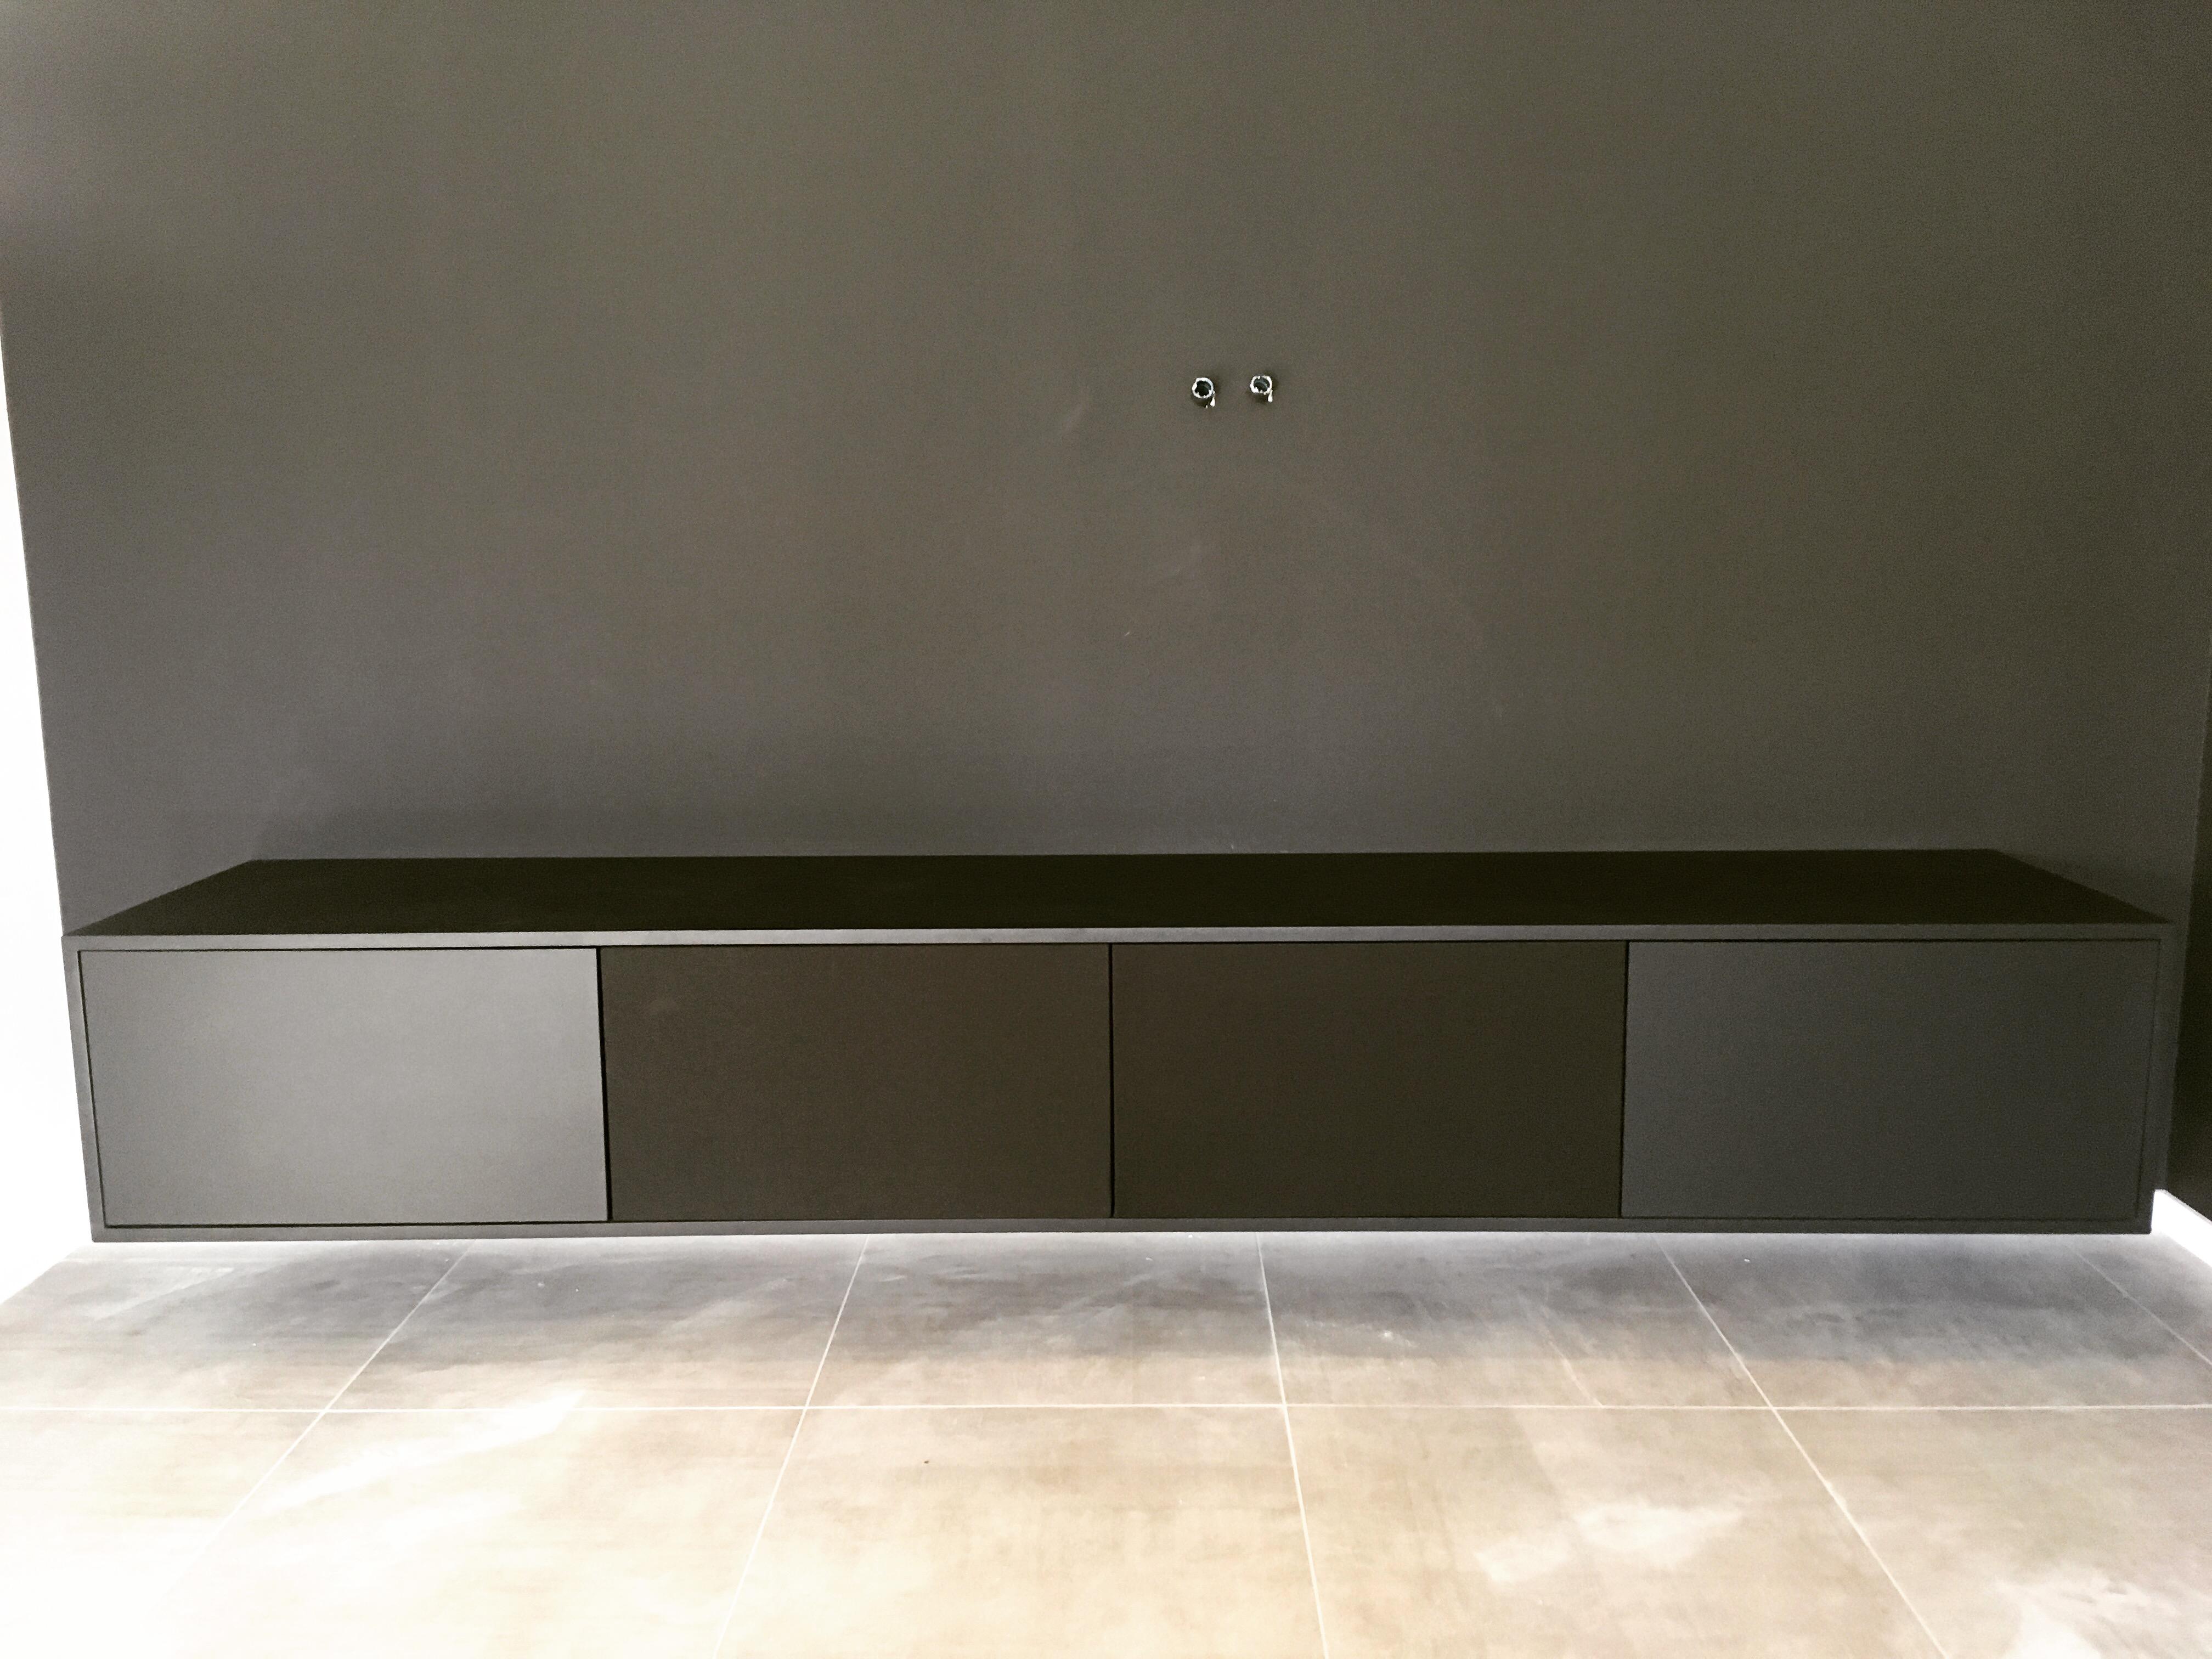 Sidste nye Design Tv Benk BIN05 - E&HCreates GU-77